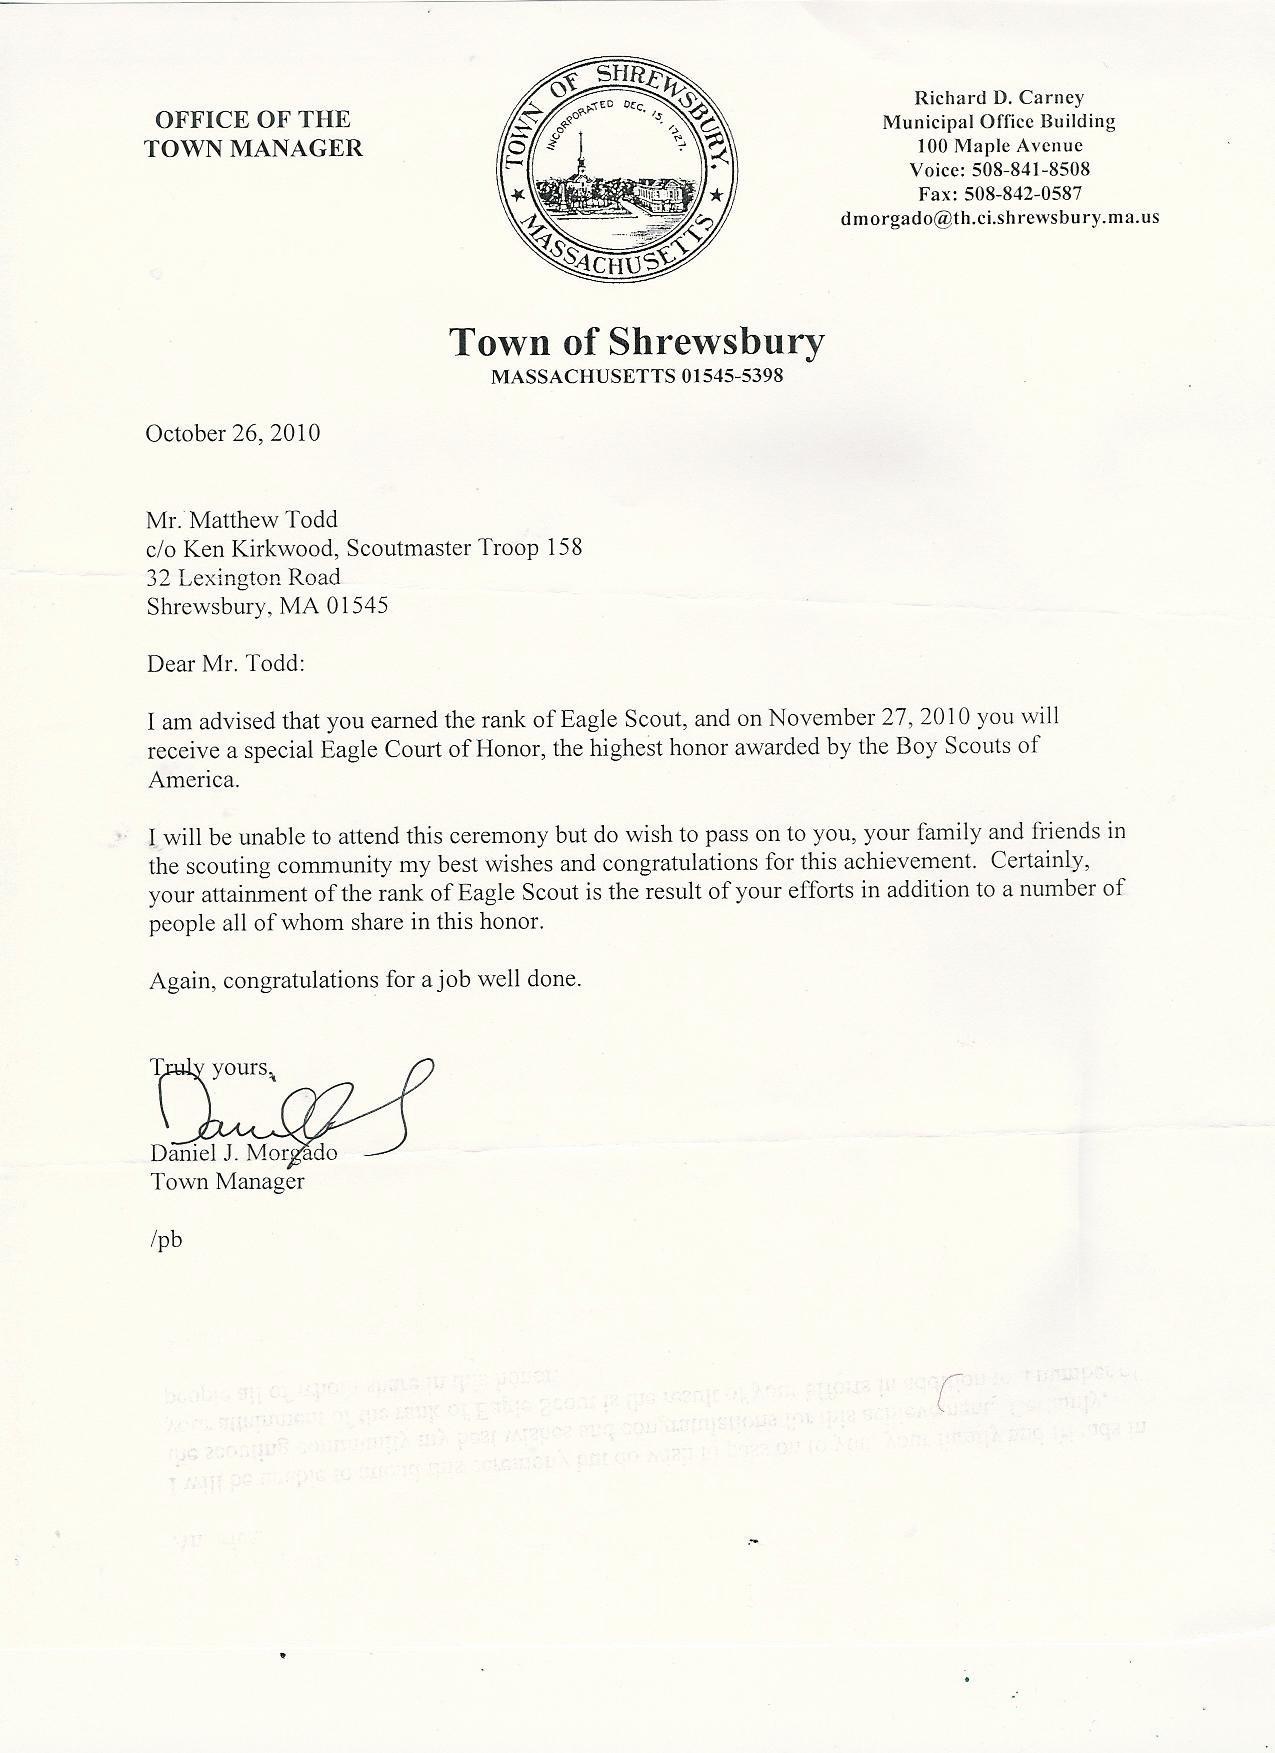 Boy Scouts Letter Of Recommendation Fresh Eagle Scout Letters Re Mendation